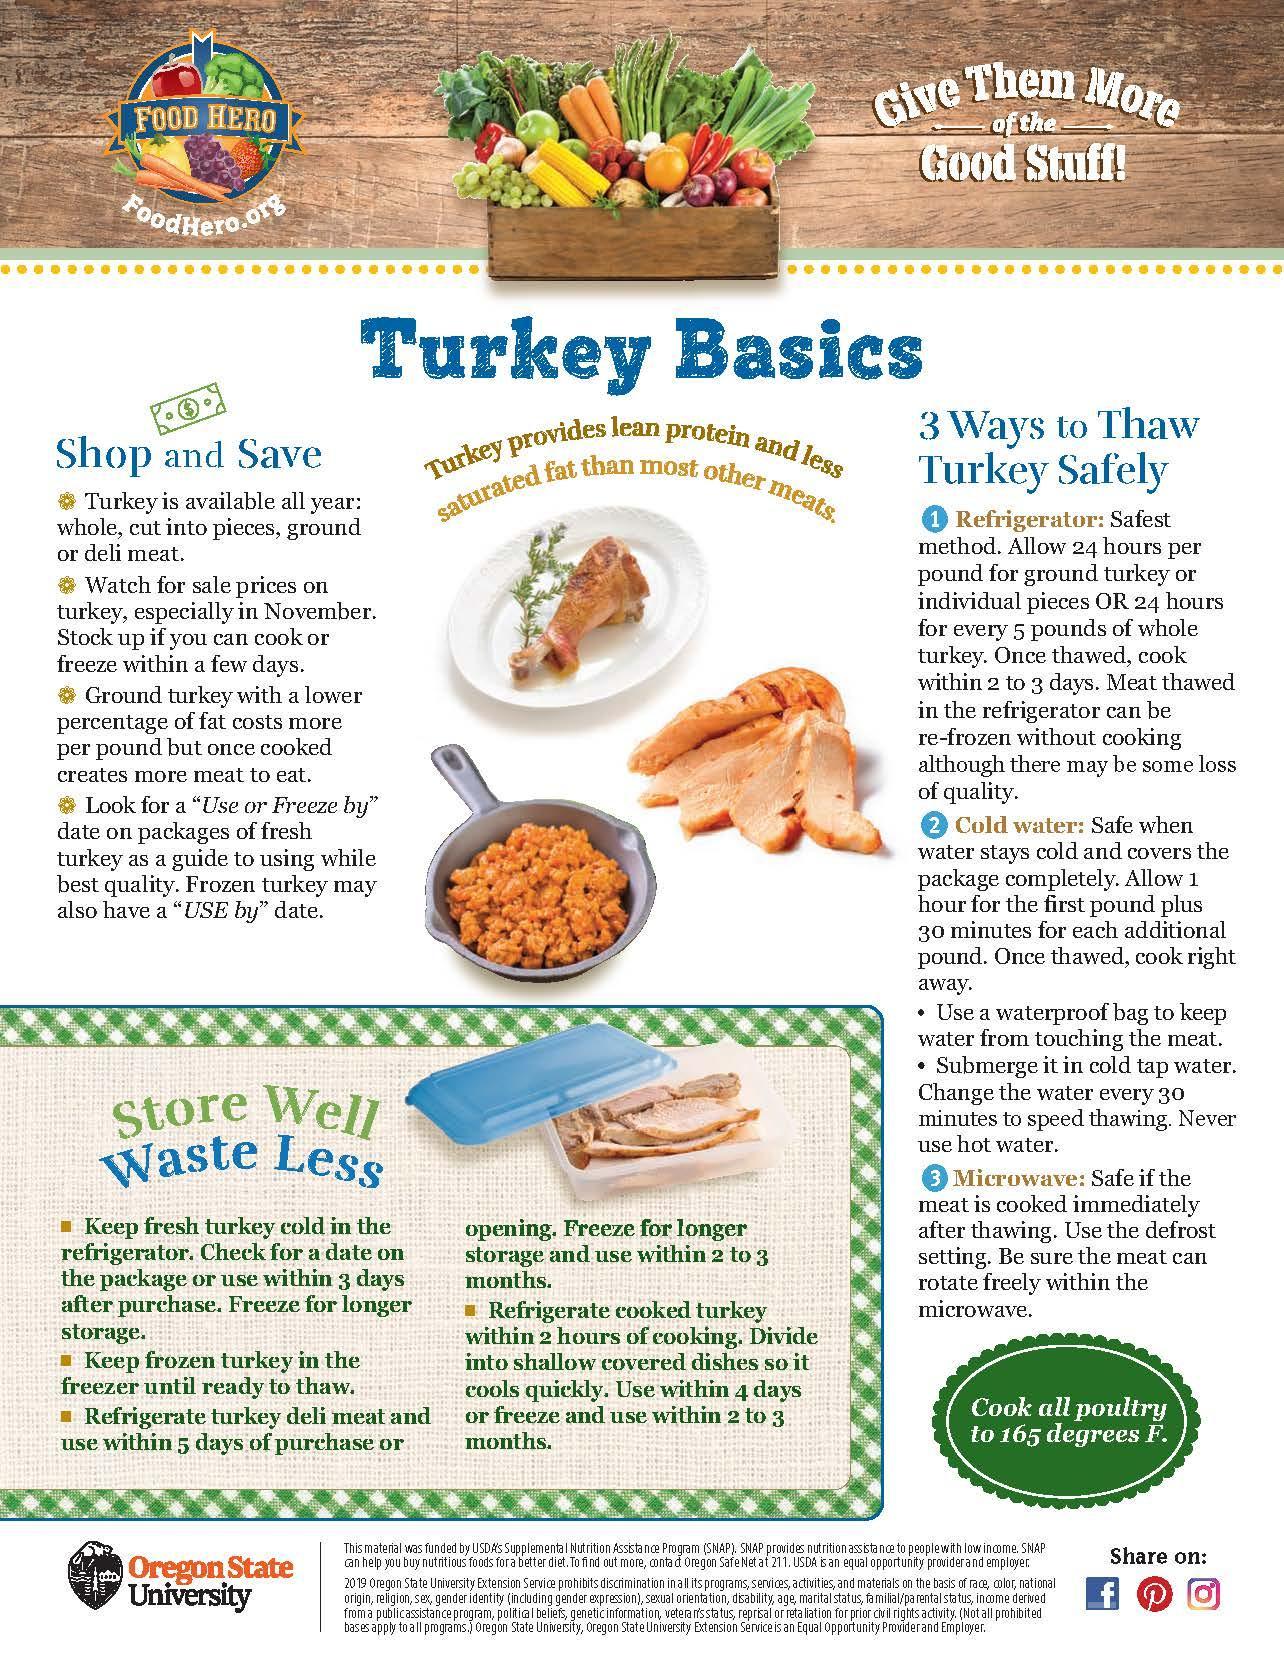 Turkey Basics